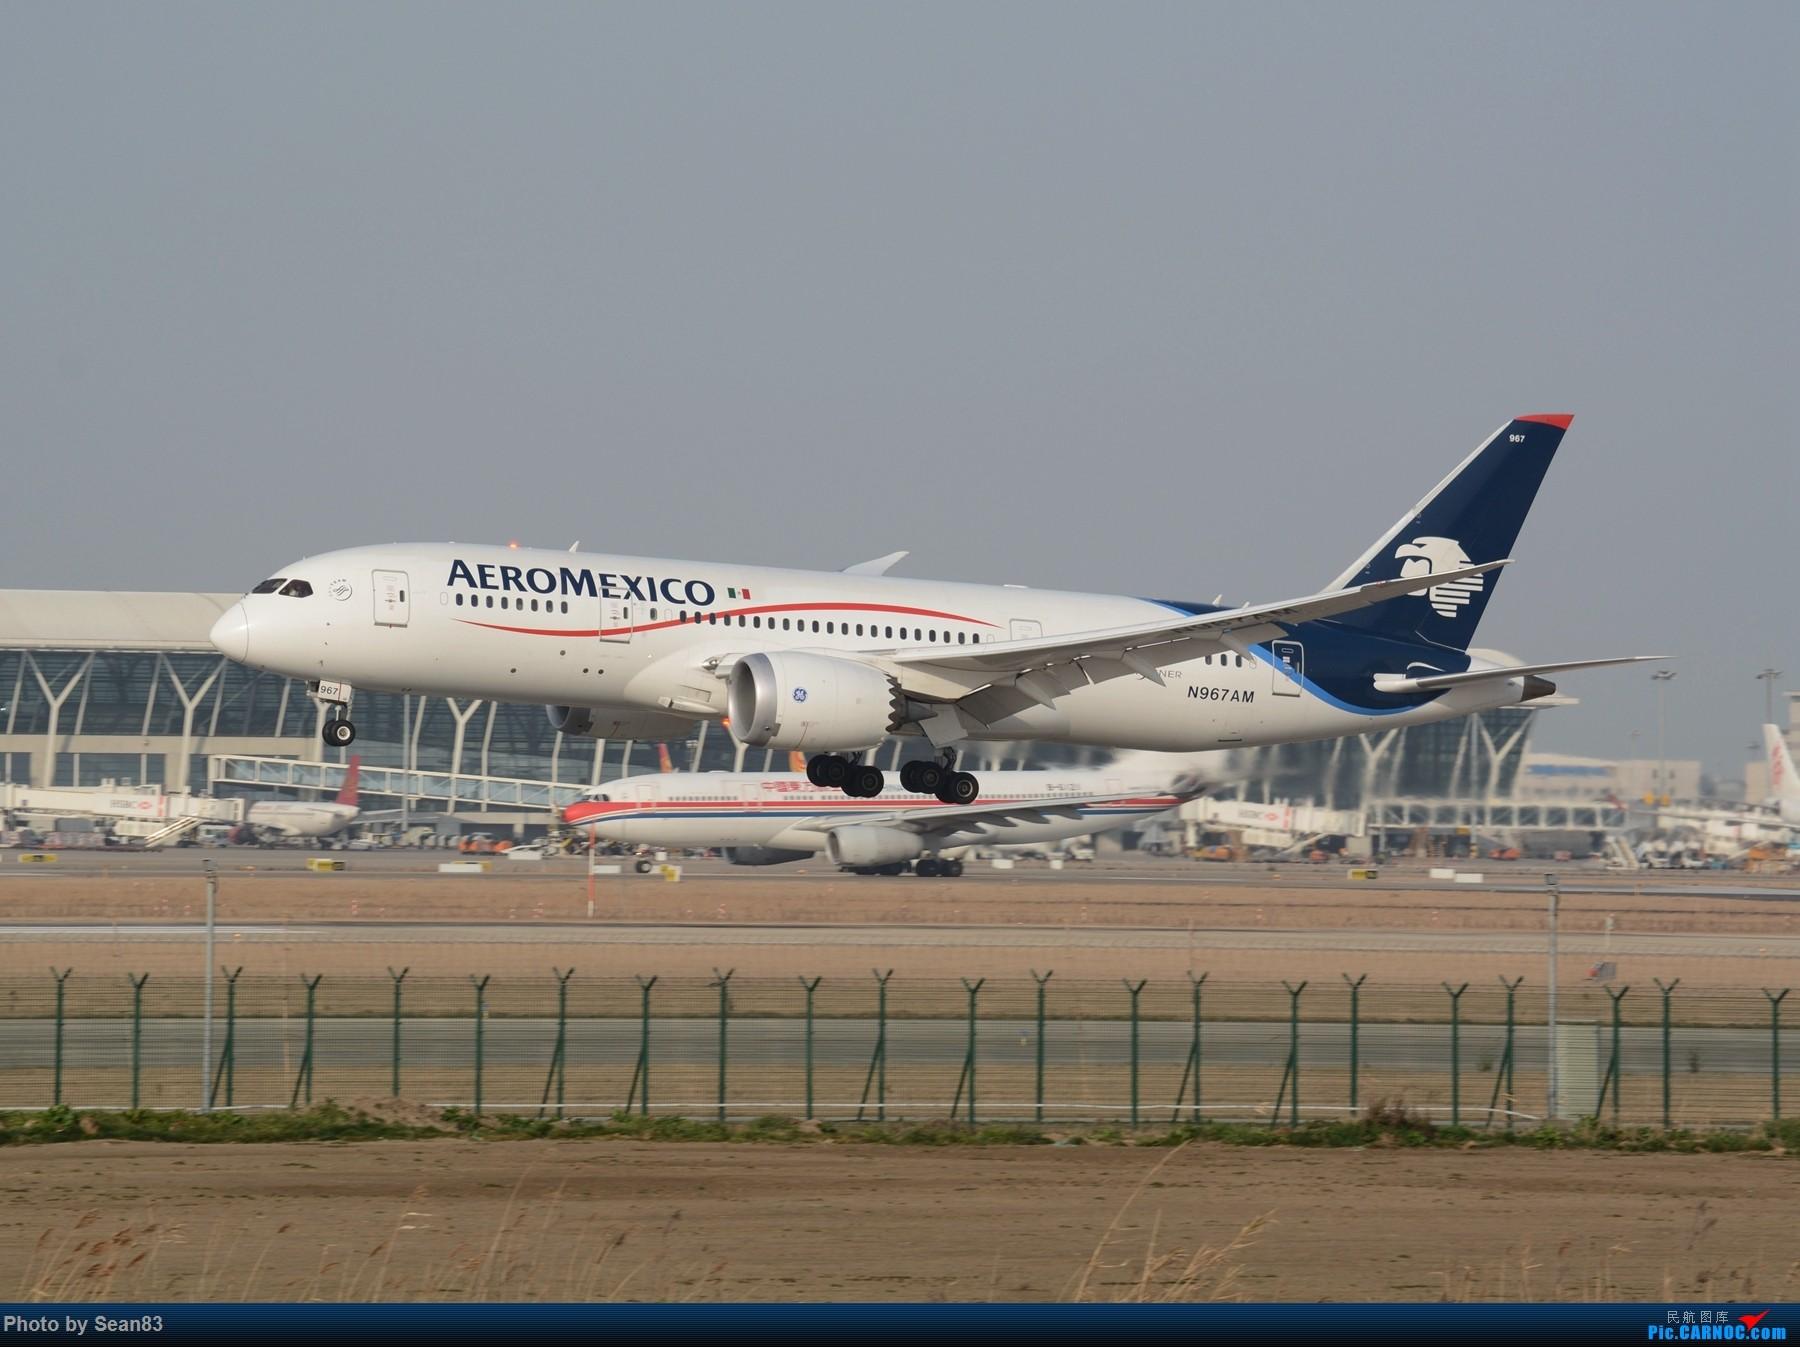 Re:[原创](浦东)加航新涂装以及一些常规货 BOEING 787-8 N967AM 上海浦东国际机场